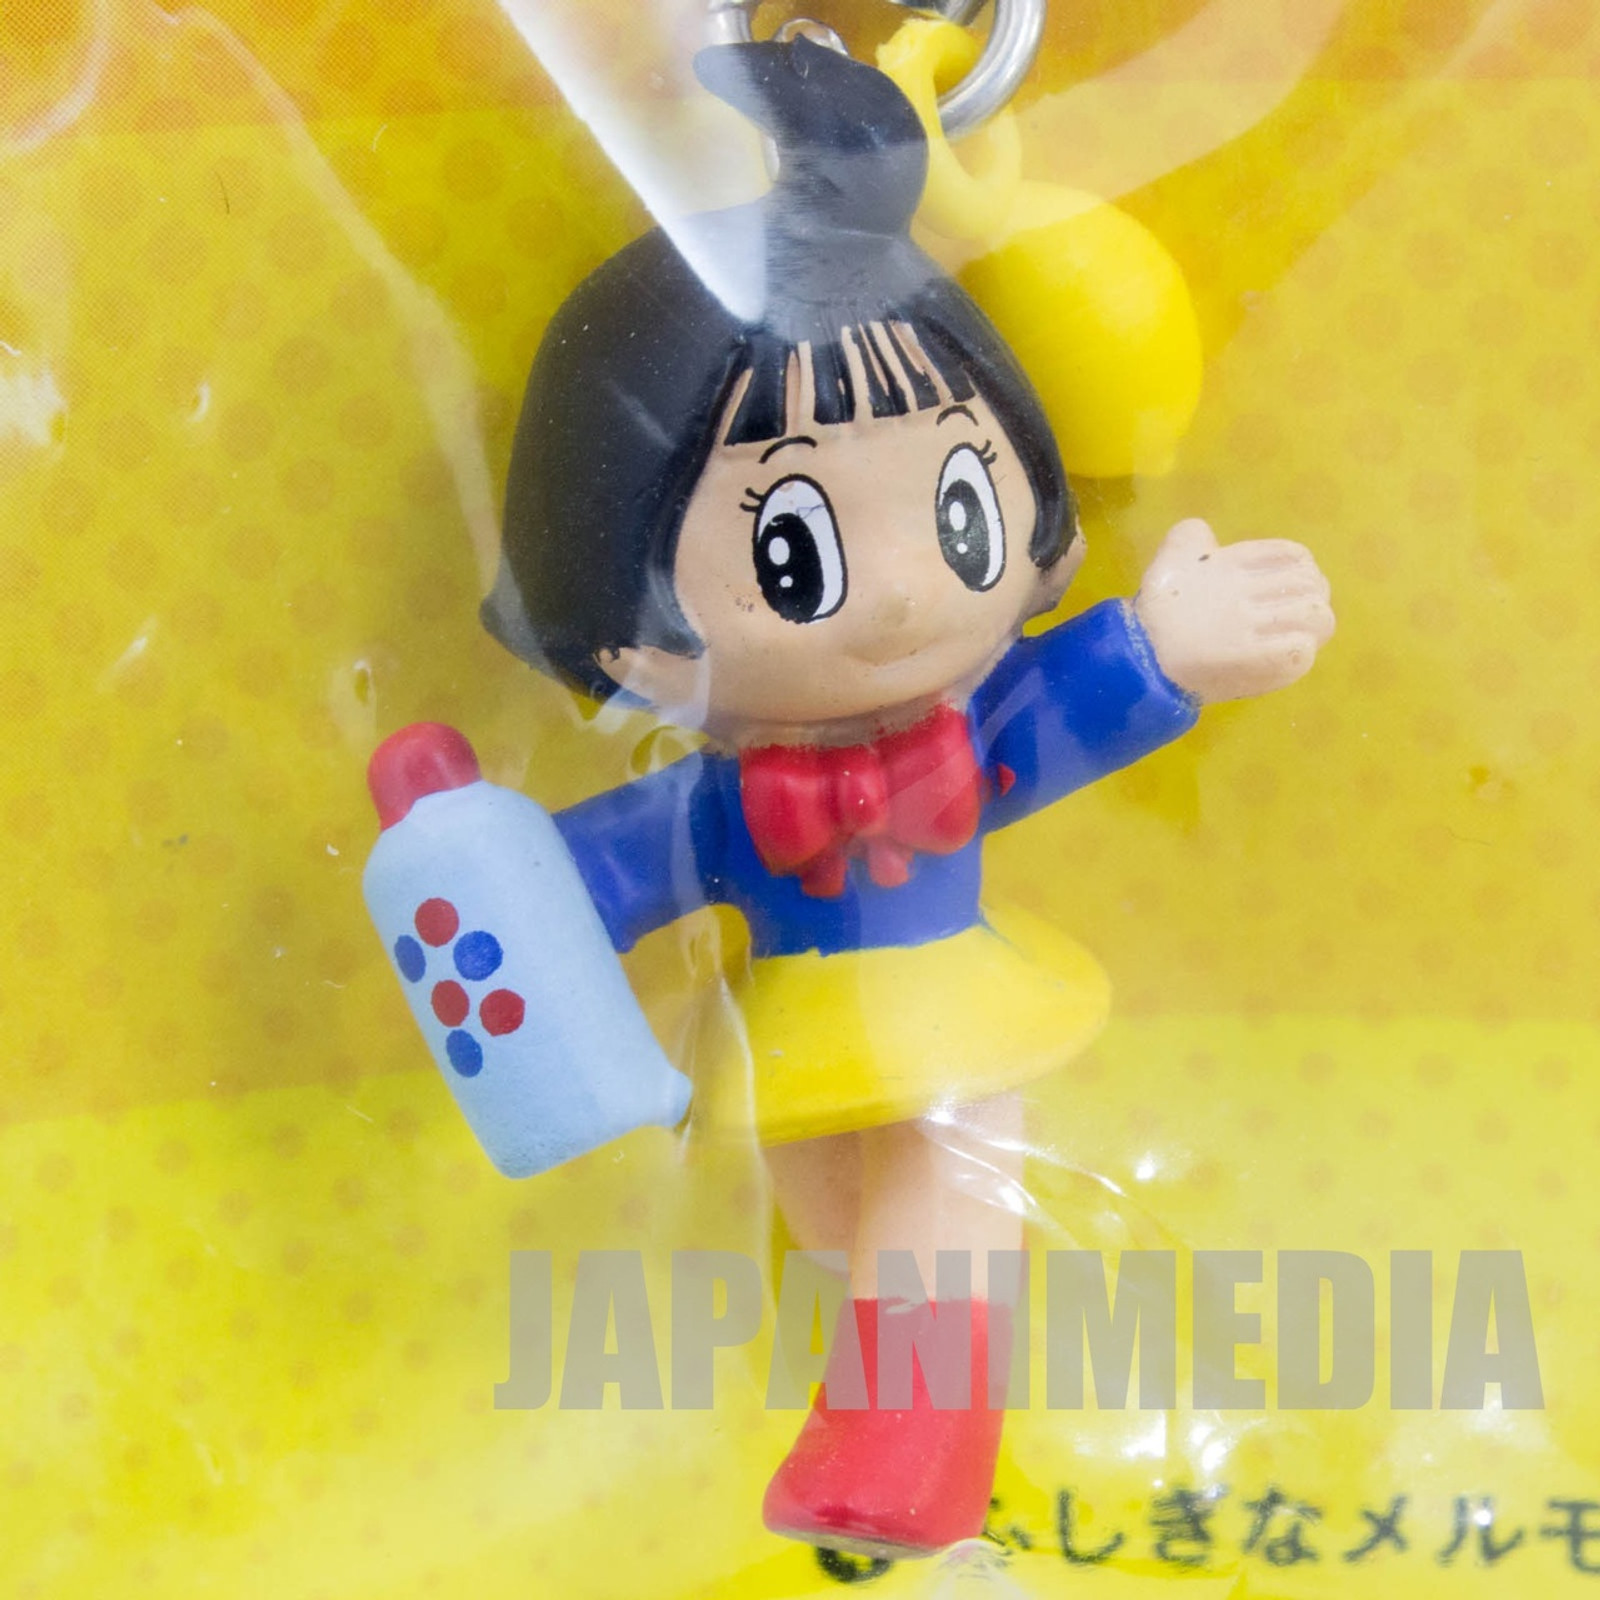 Marvelous Melmo One Mascot Figure Strap Osamu Tezuka JAPAN ANIME